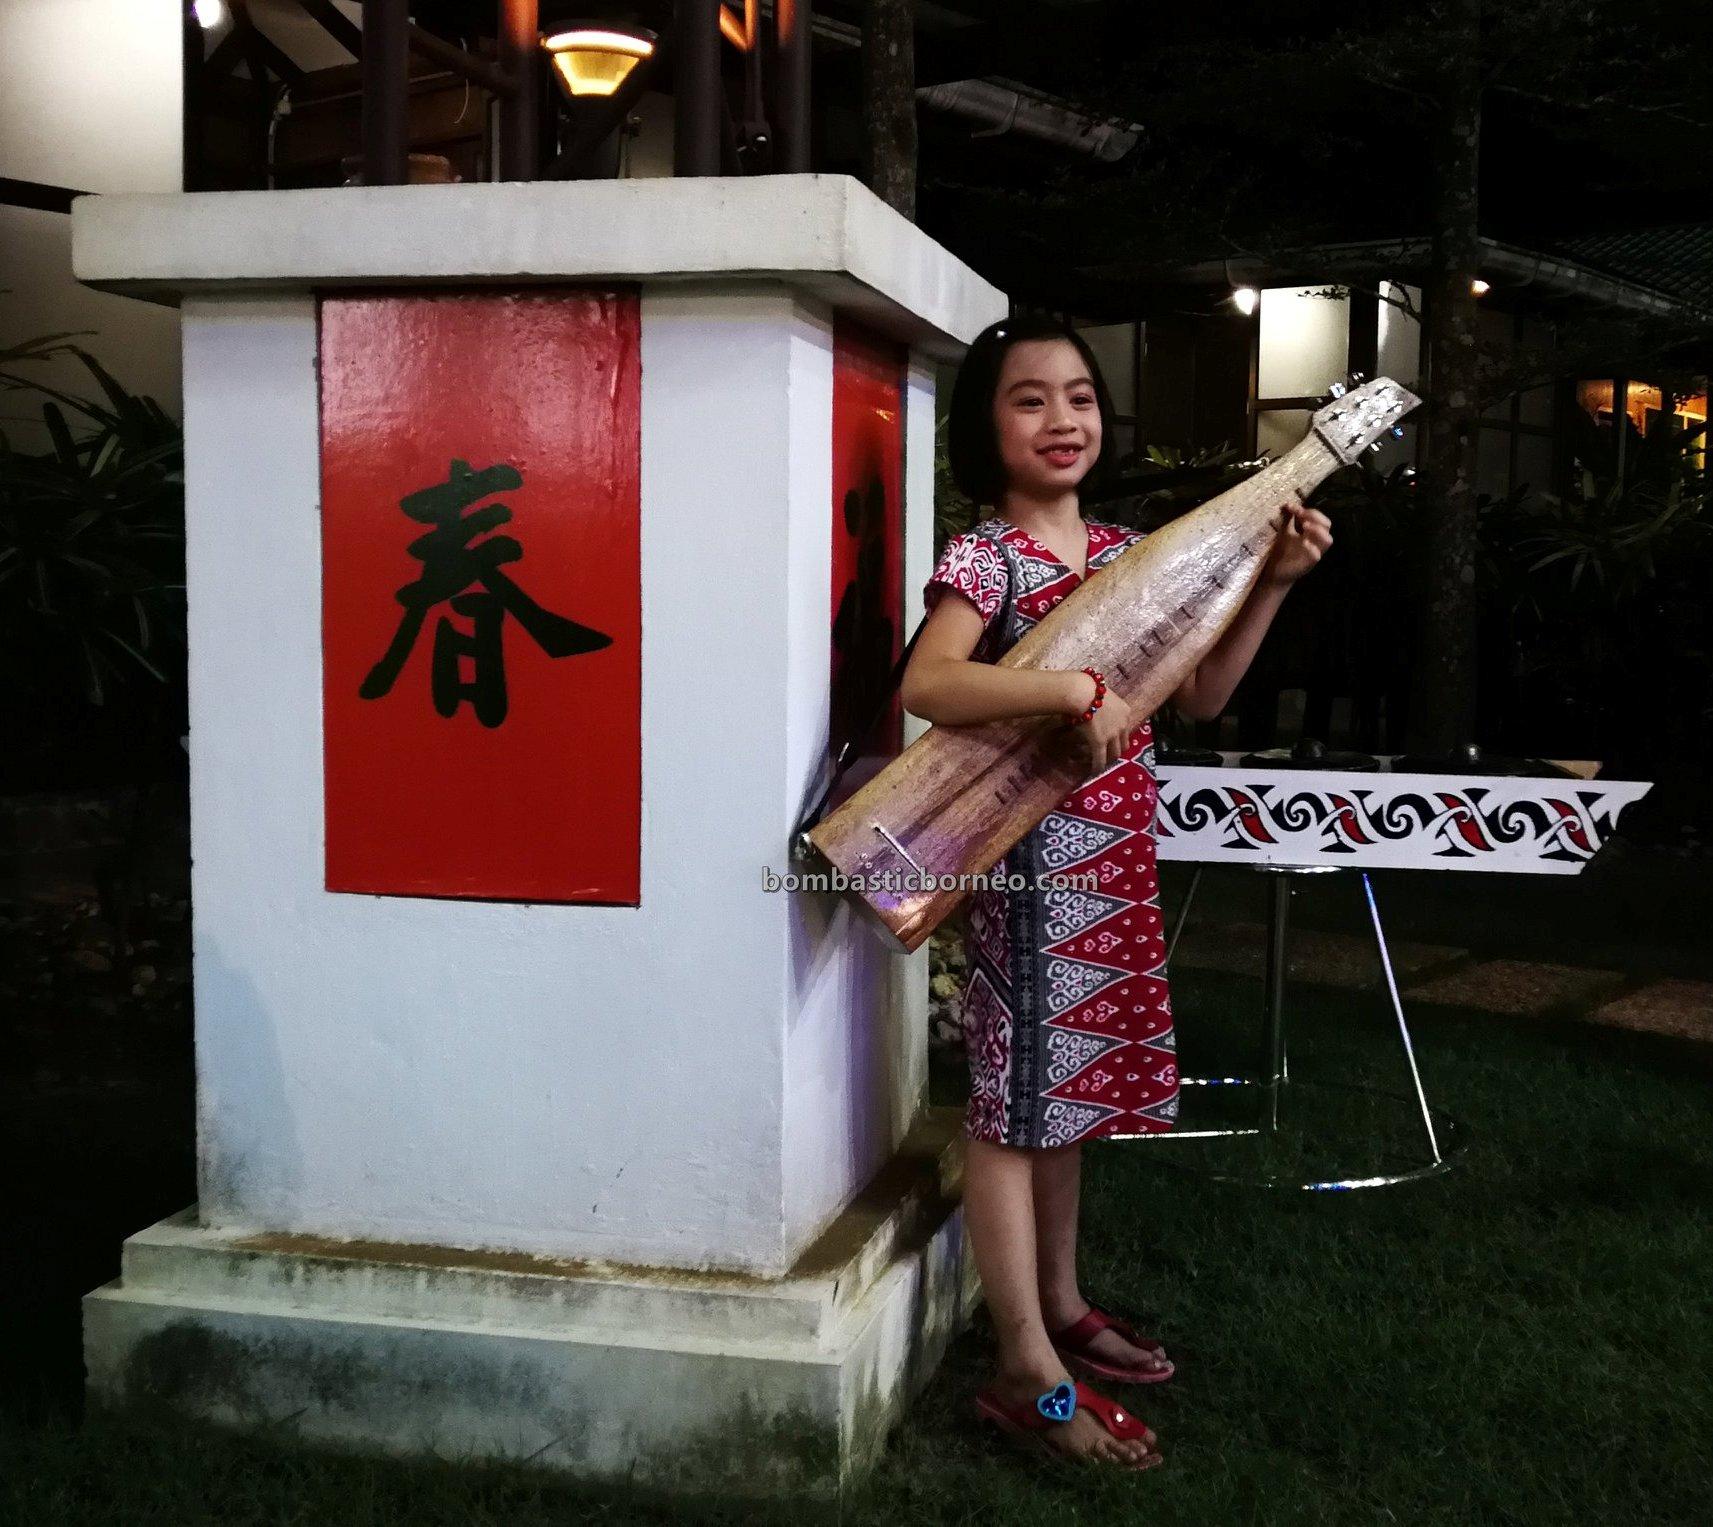 Borneo guitar, authentic, traditional, event, Ethnic, native, tribe, orang ulu, musical instrument, Sibu, One Malaysia Cultural Village, tourist attraction, 砂拉越原住民音乐, 马来西亚沙贝吉他